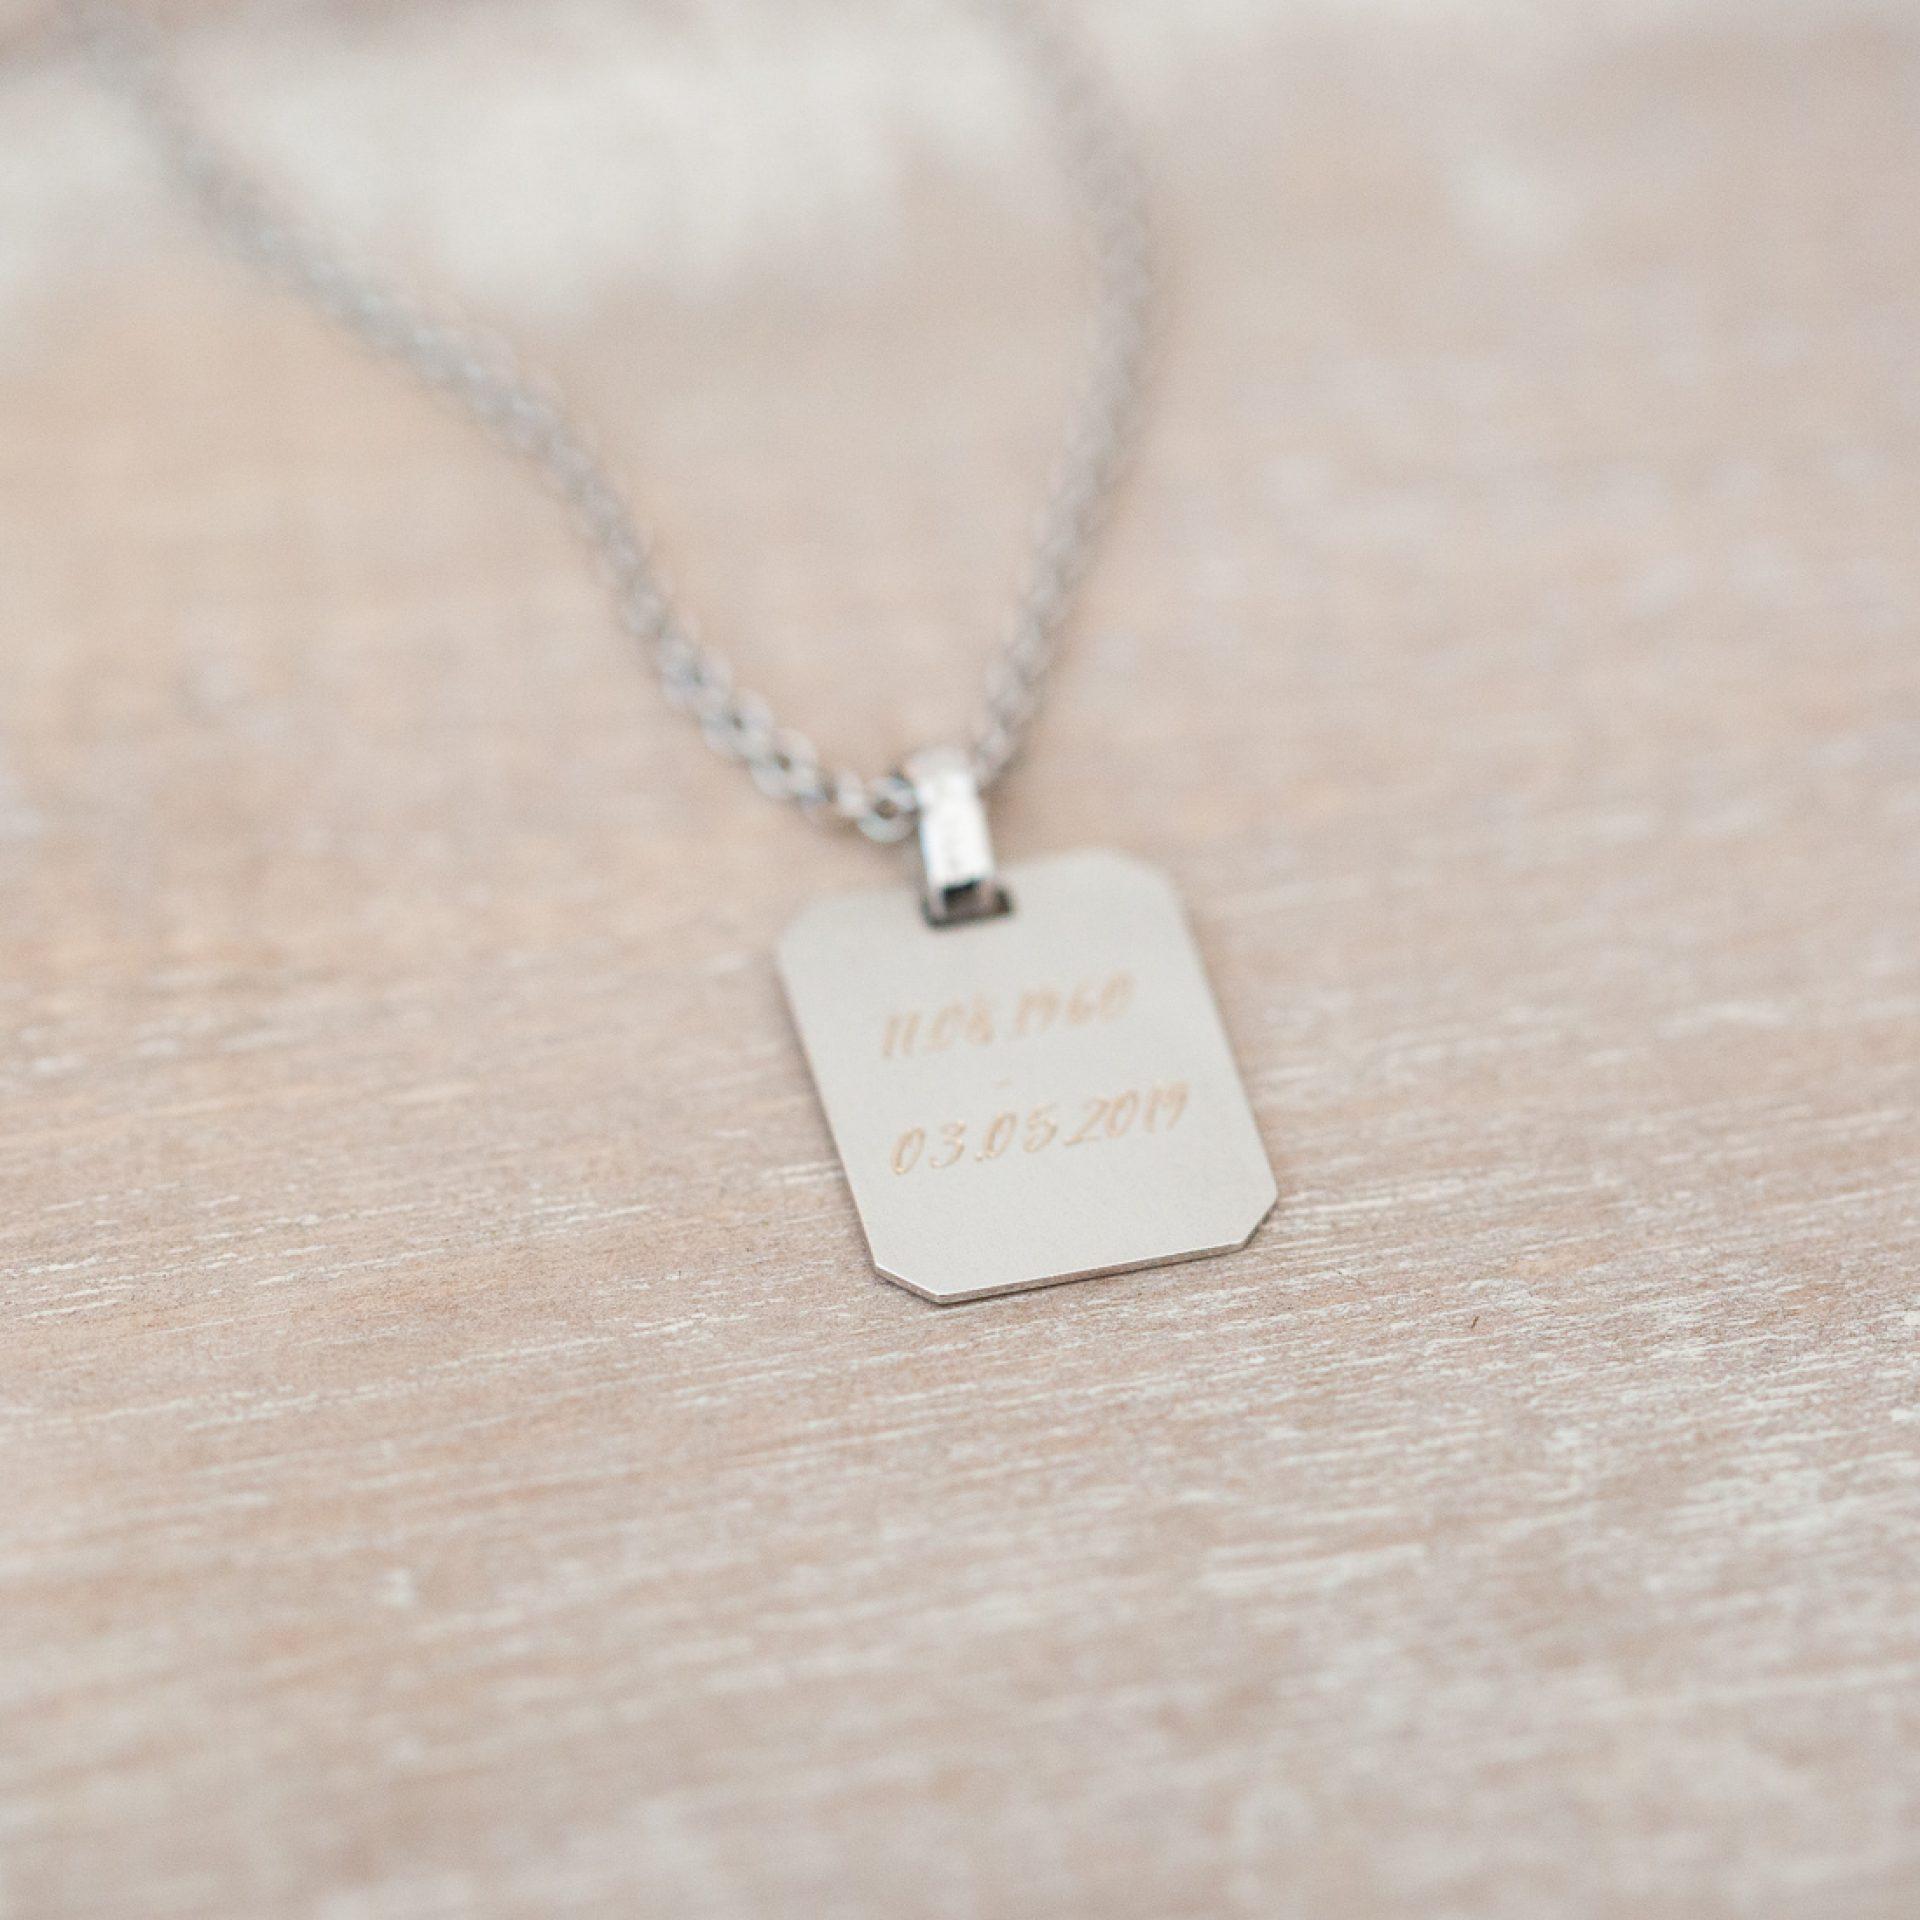 Fingerabdruck Halskette für Männer Fingerprint 750 Gold